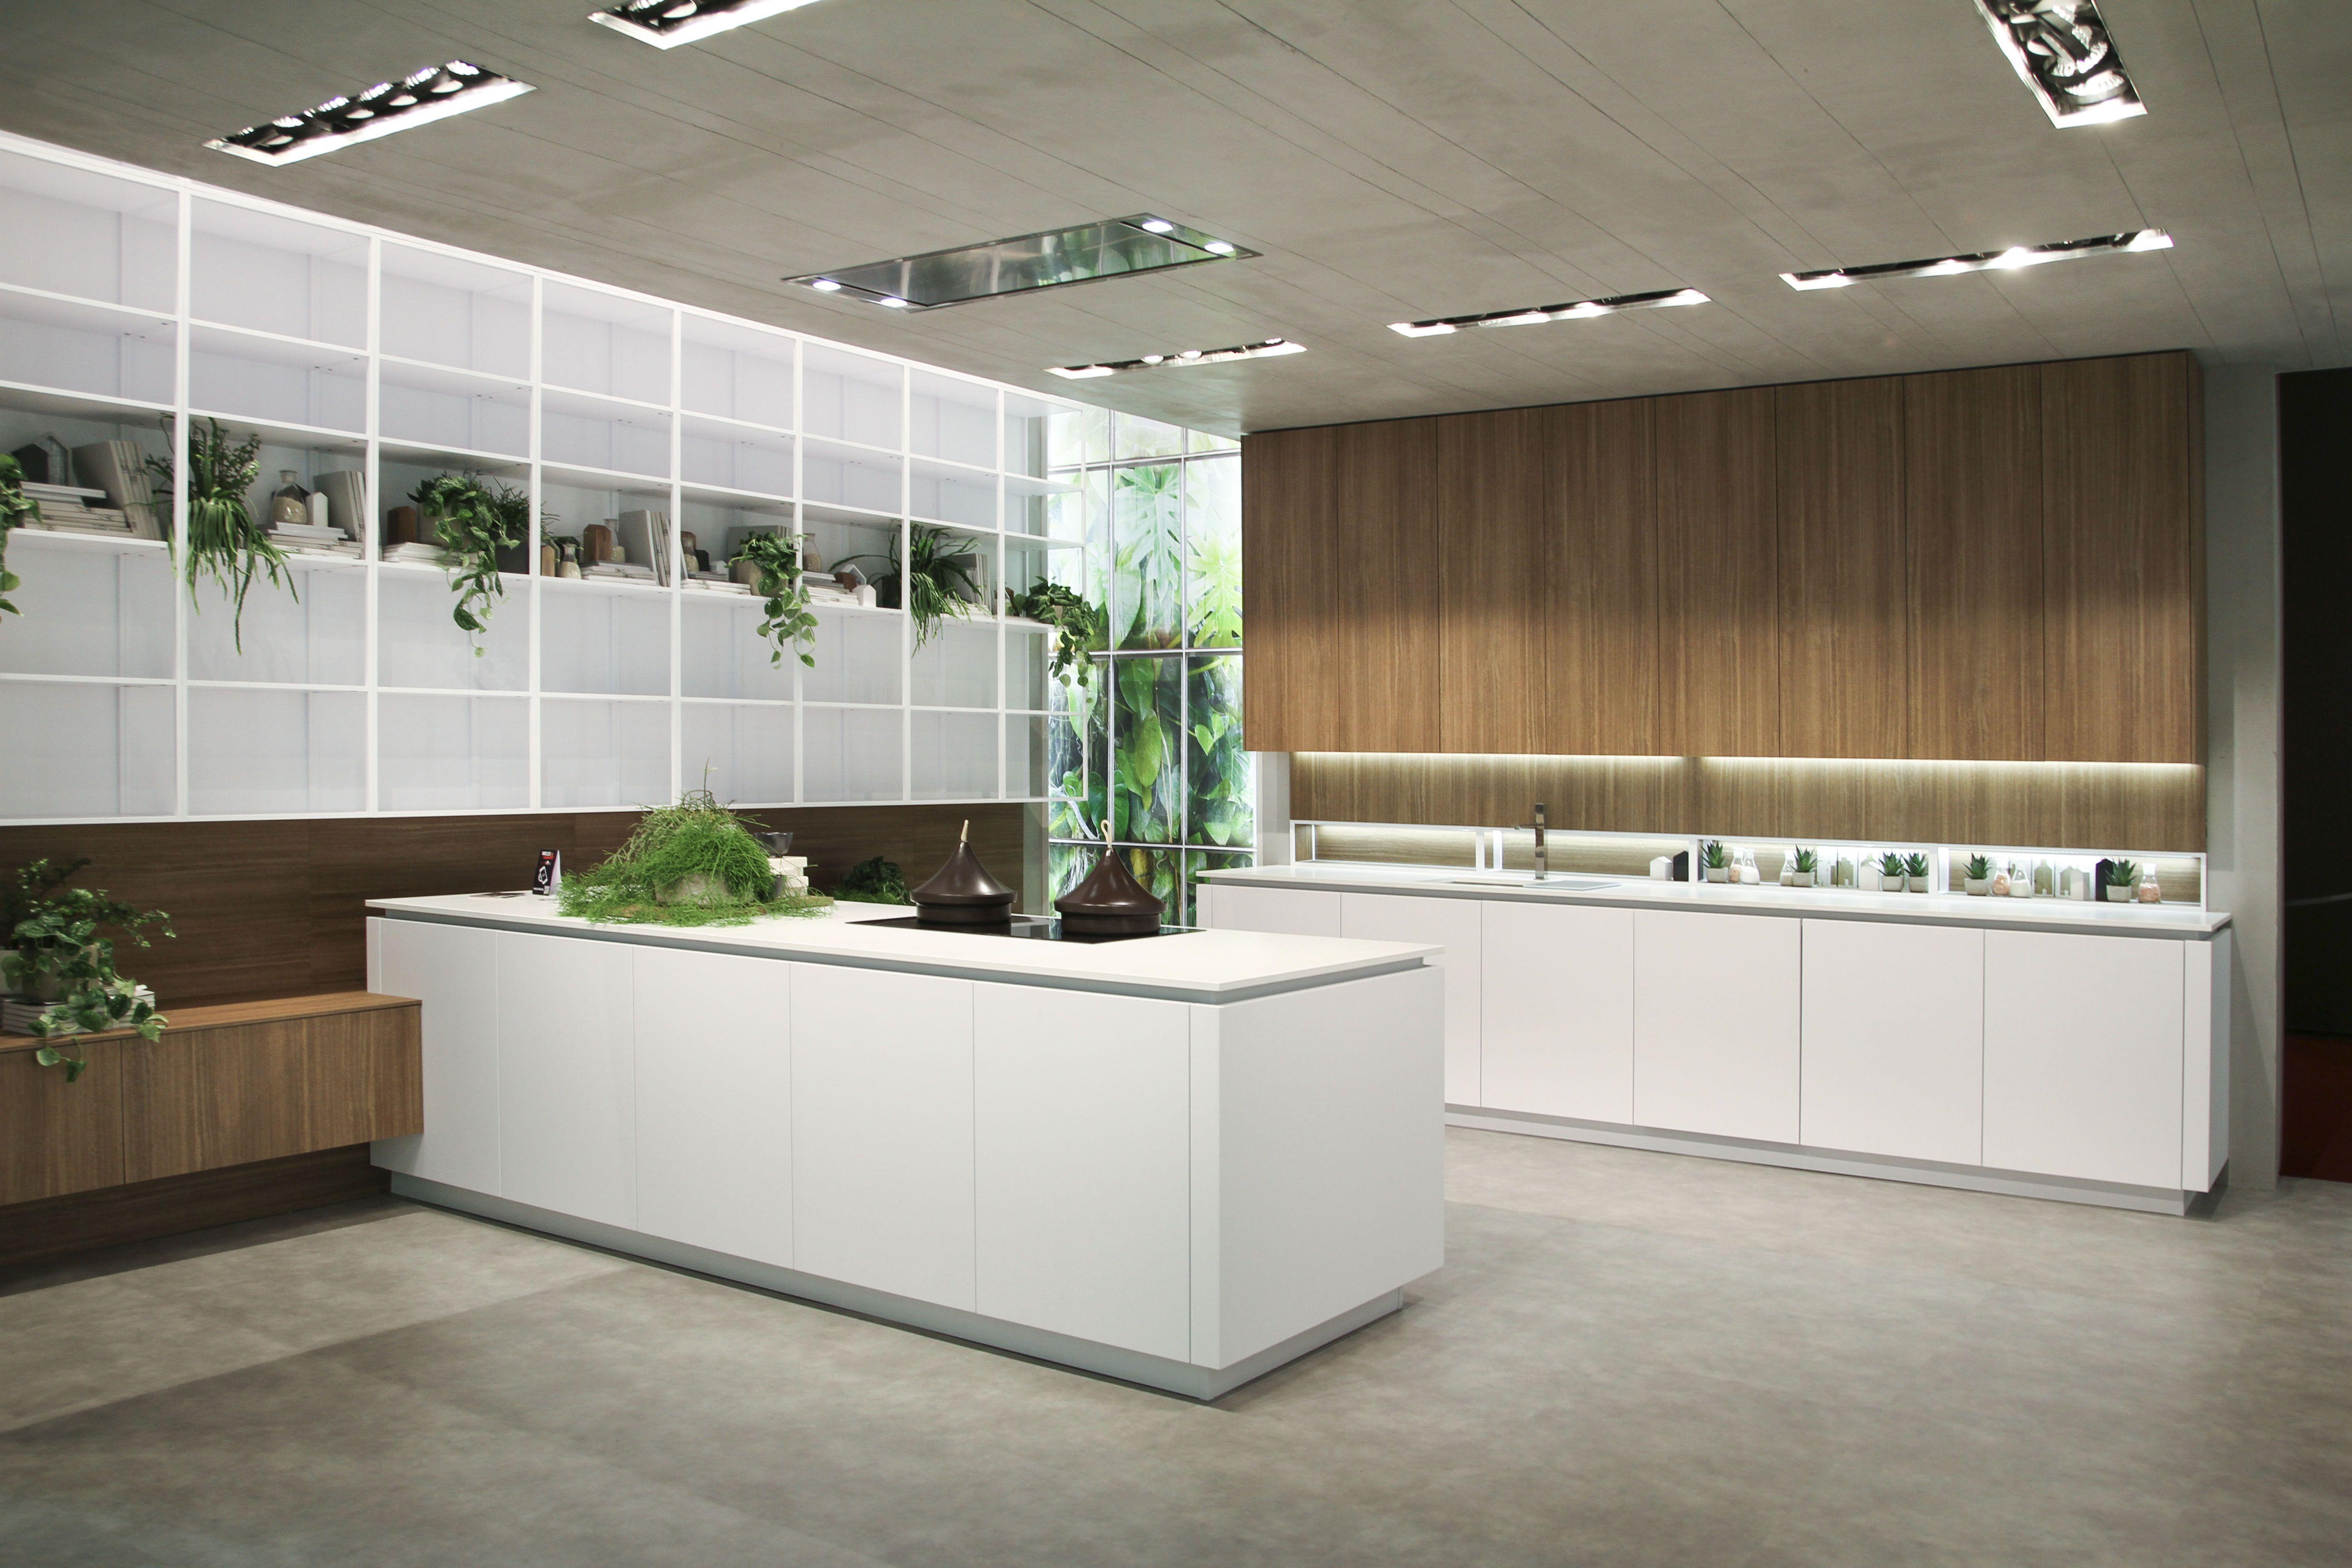 Deco Salle De Bain Beige Et Marron ~ Snaidero Look Designed By The Architect Michele Marcon Is An